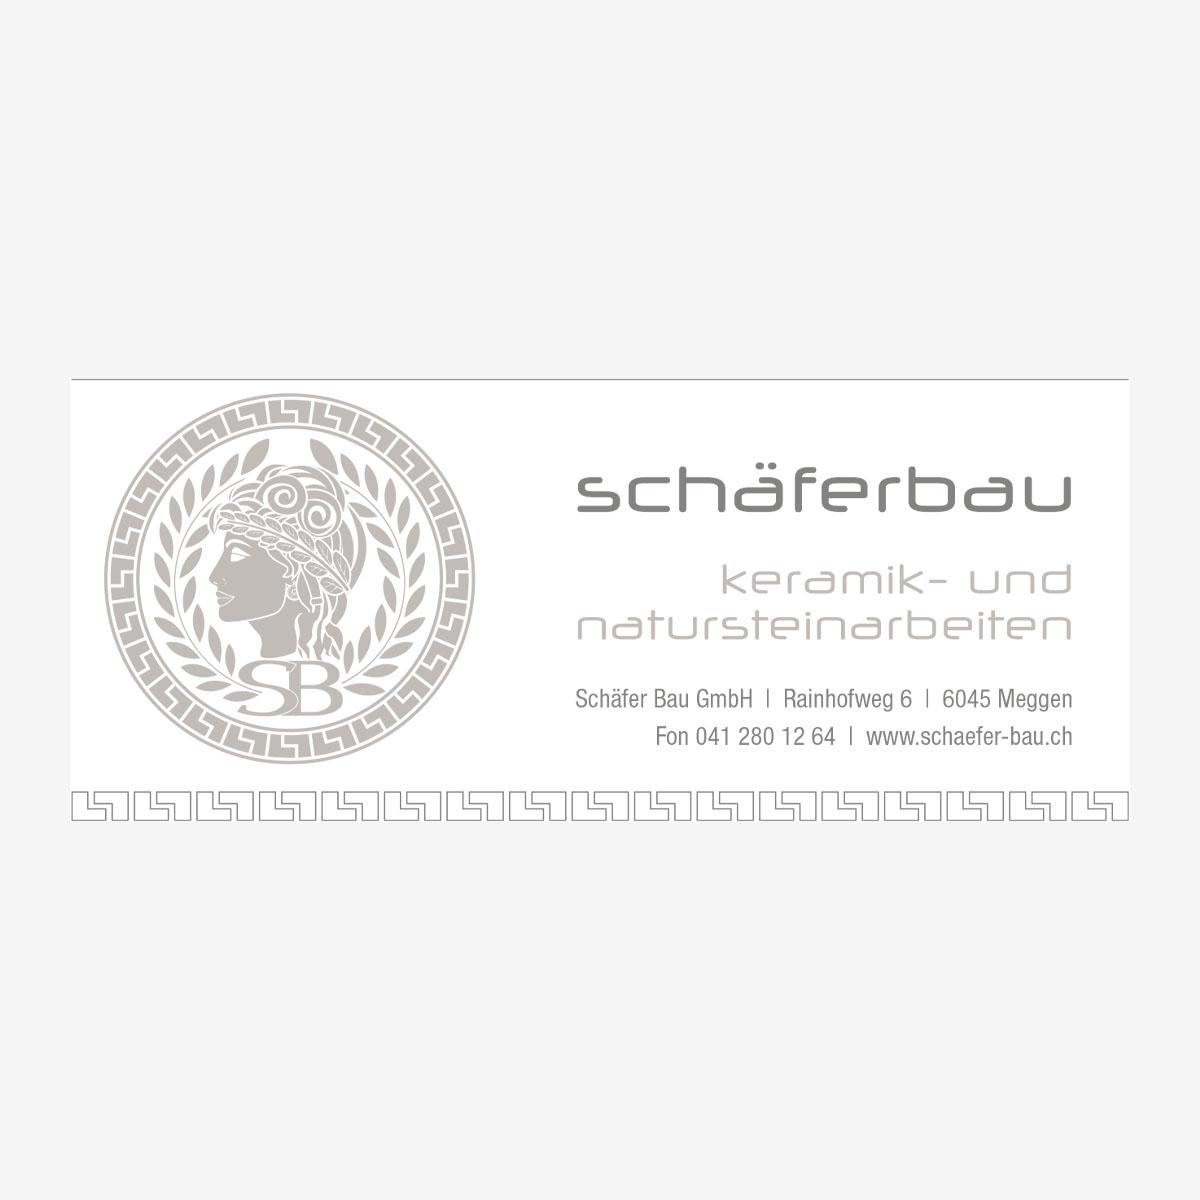 sponsoring_schäferbau.jpg